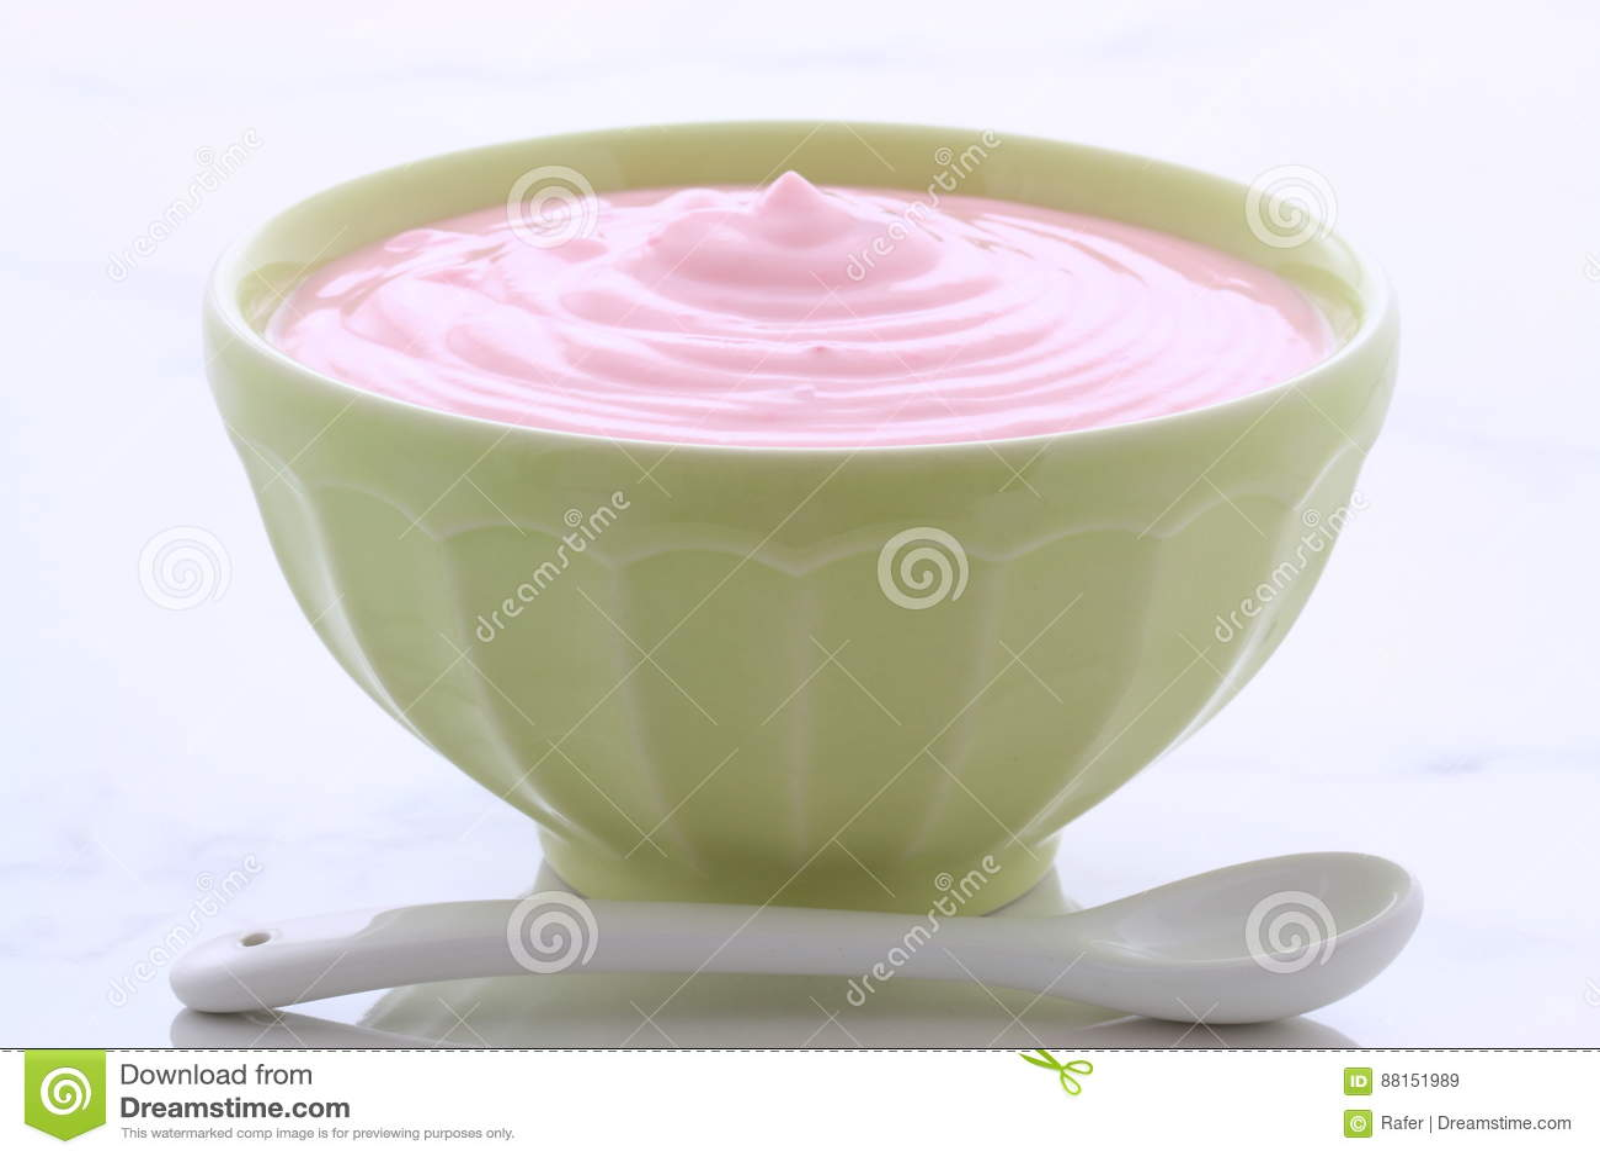 Yogur griego perdida de peso